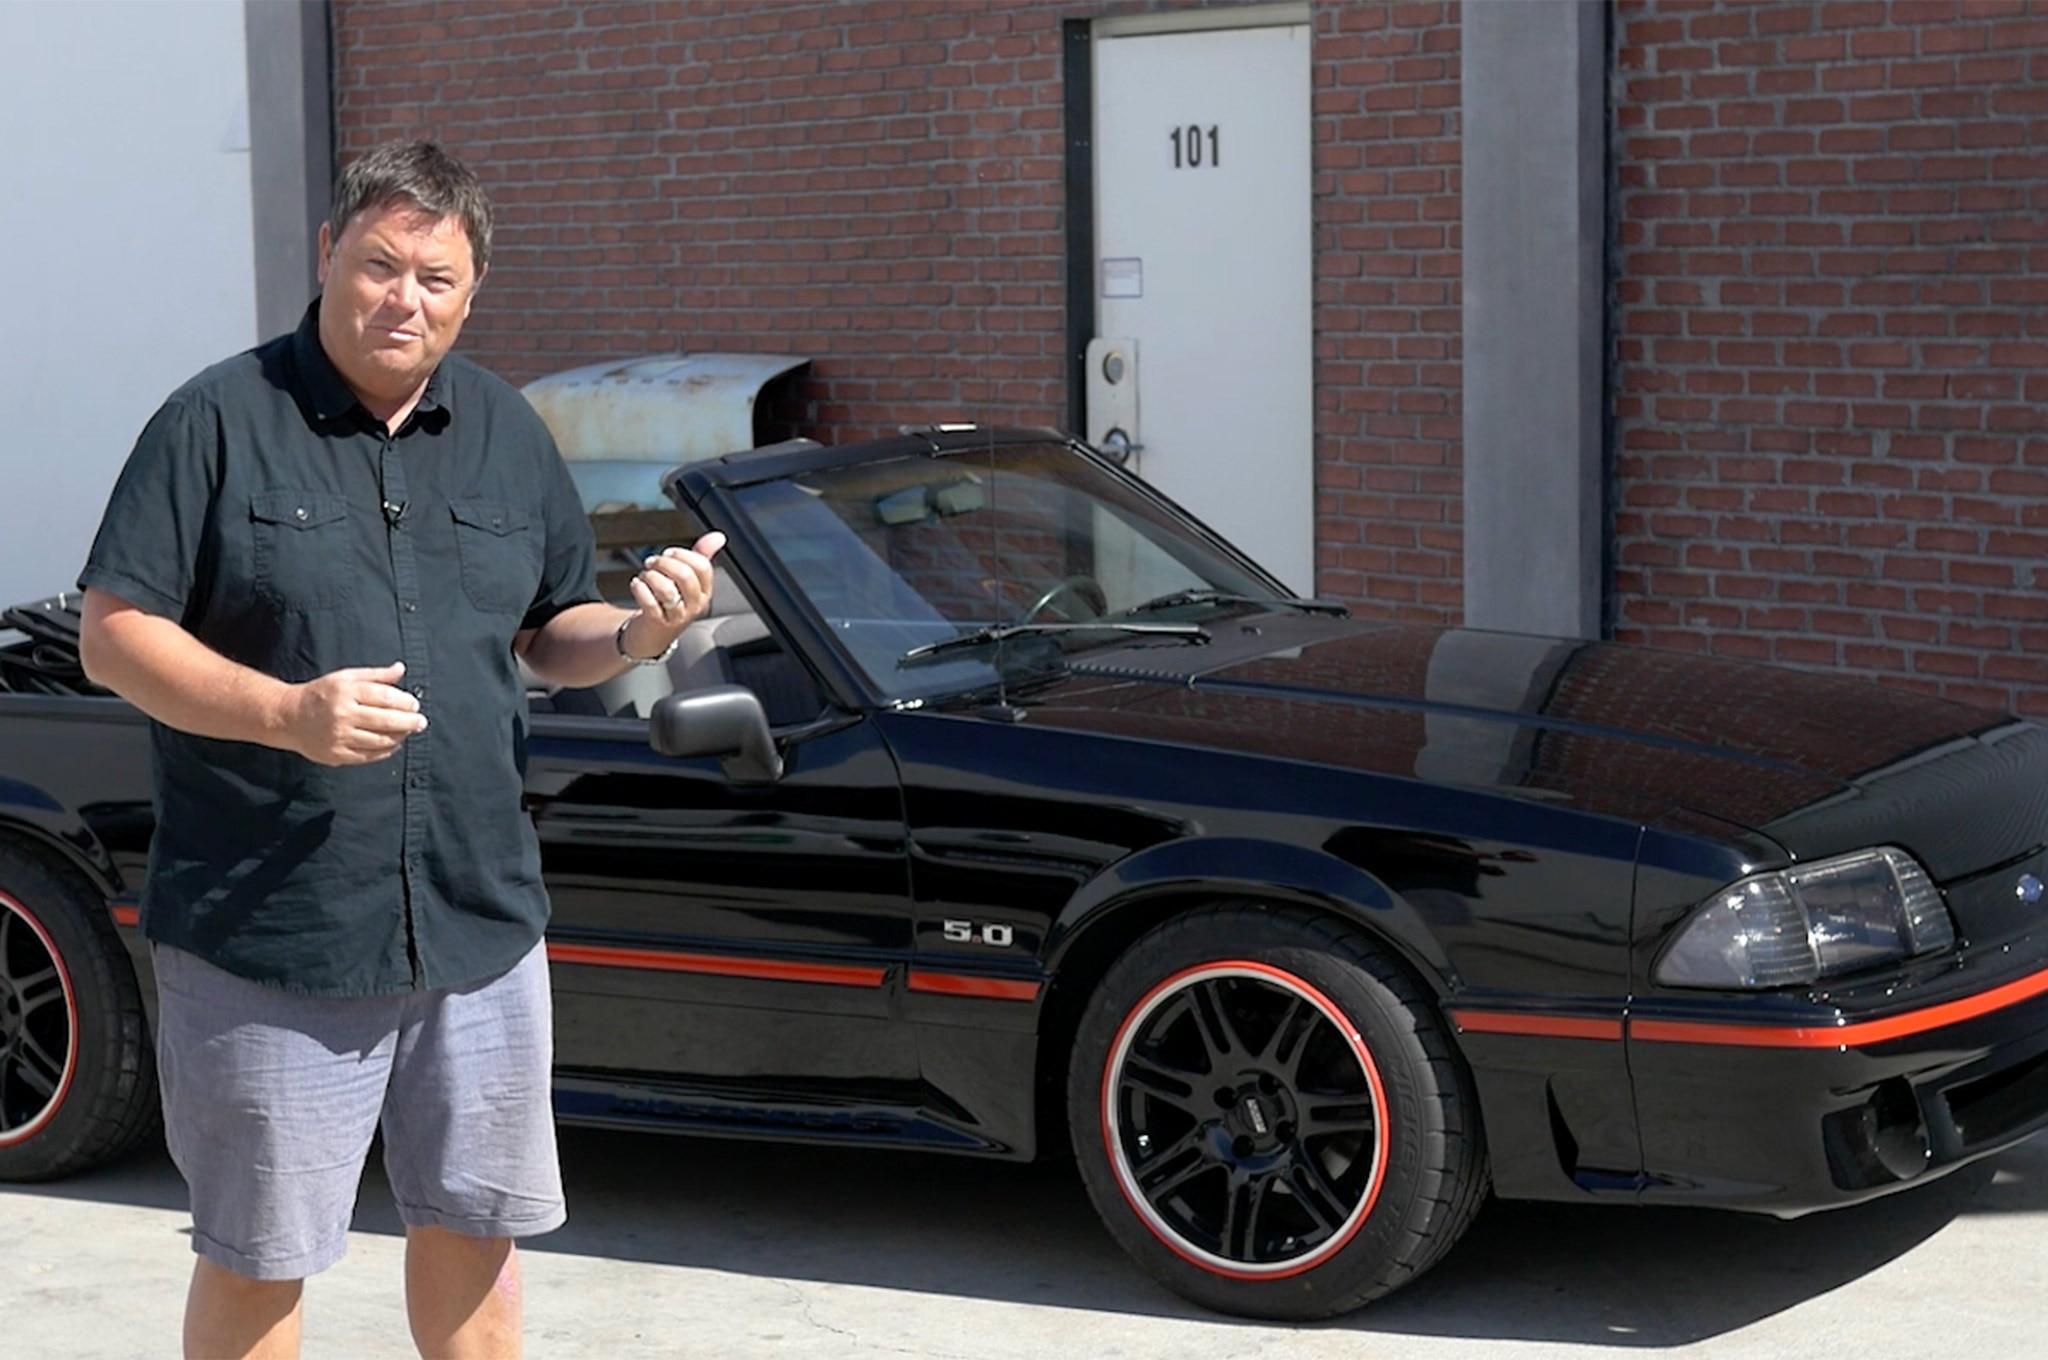 001 1988 Mustang 5 Wheeler Dealers Mike Brewer MMFF Episode